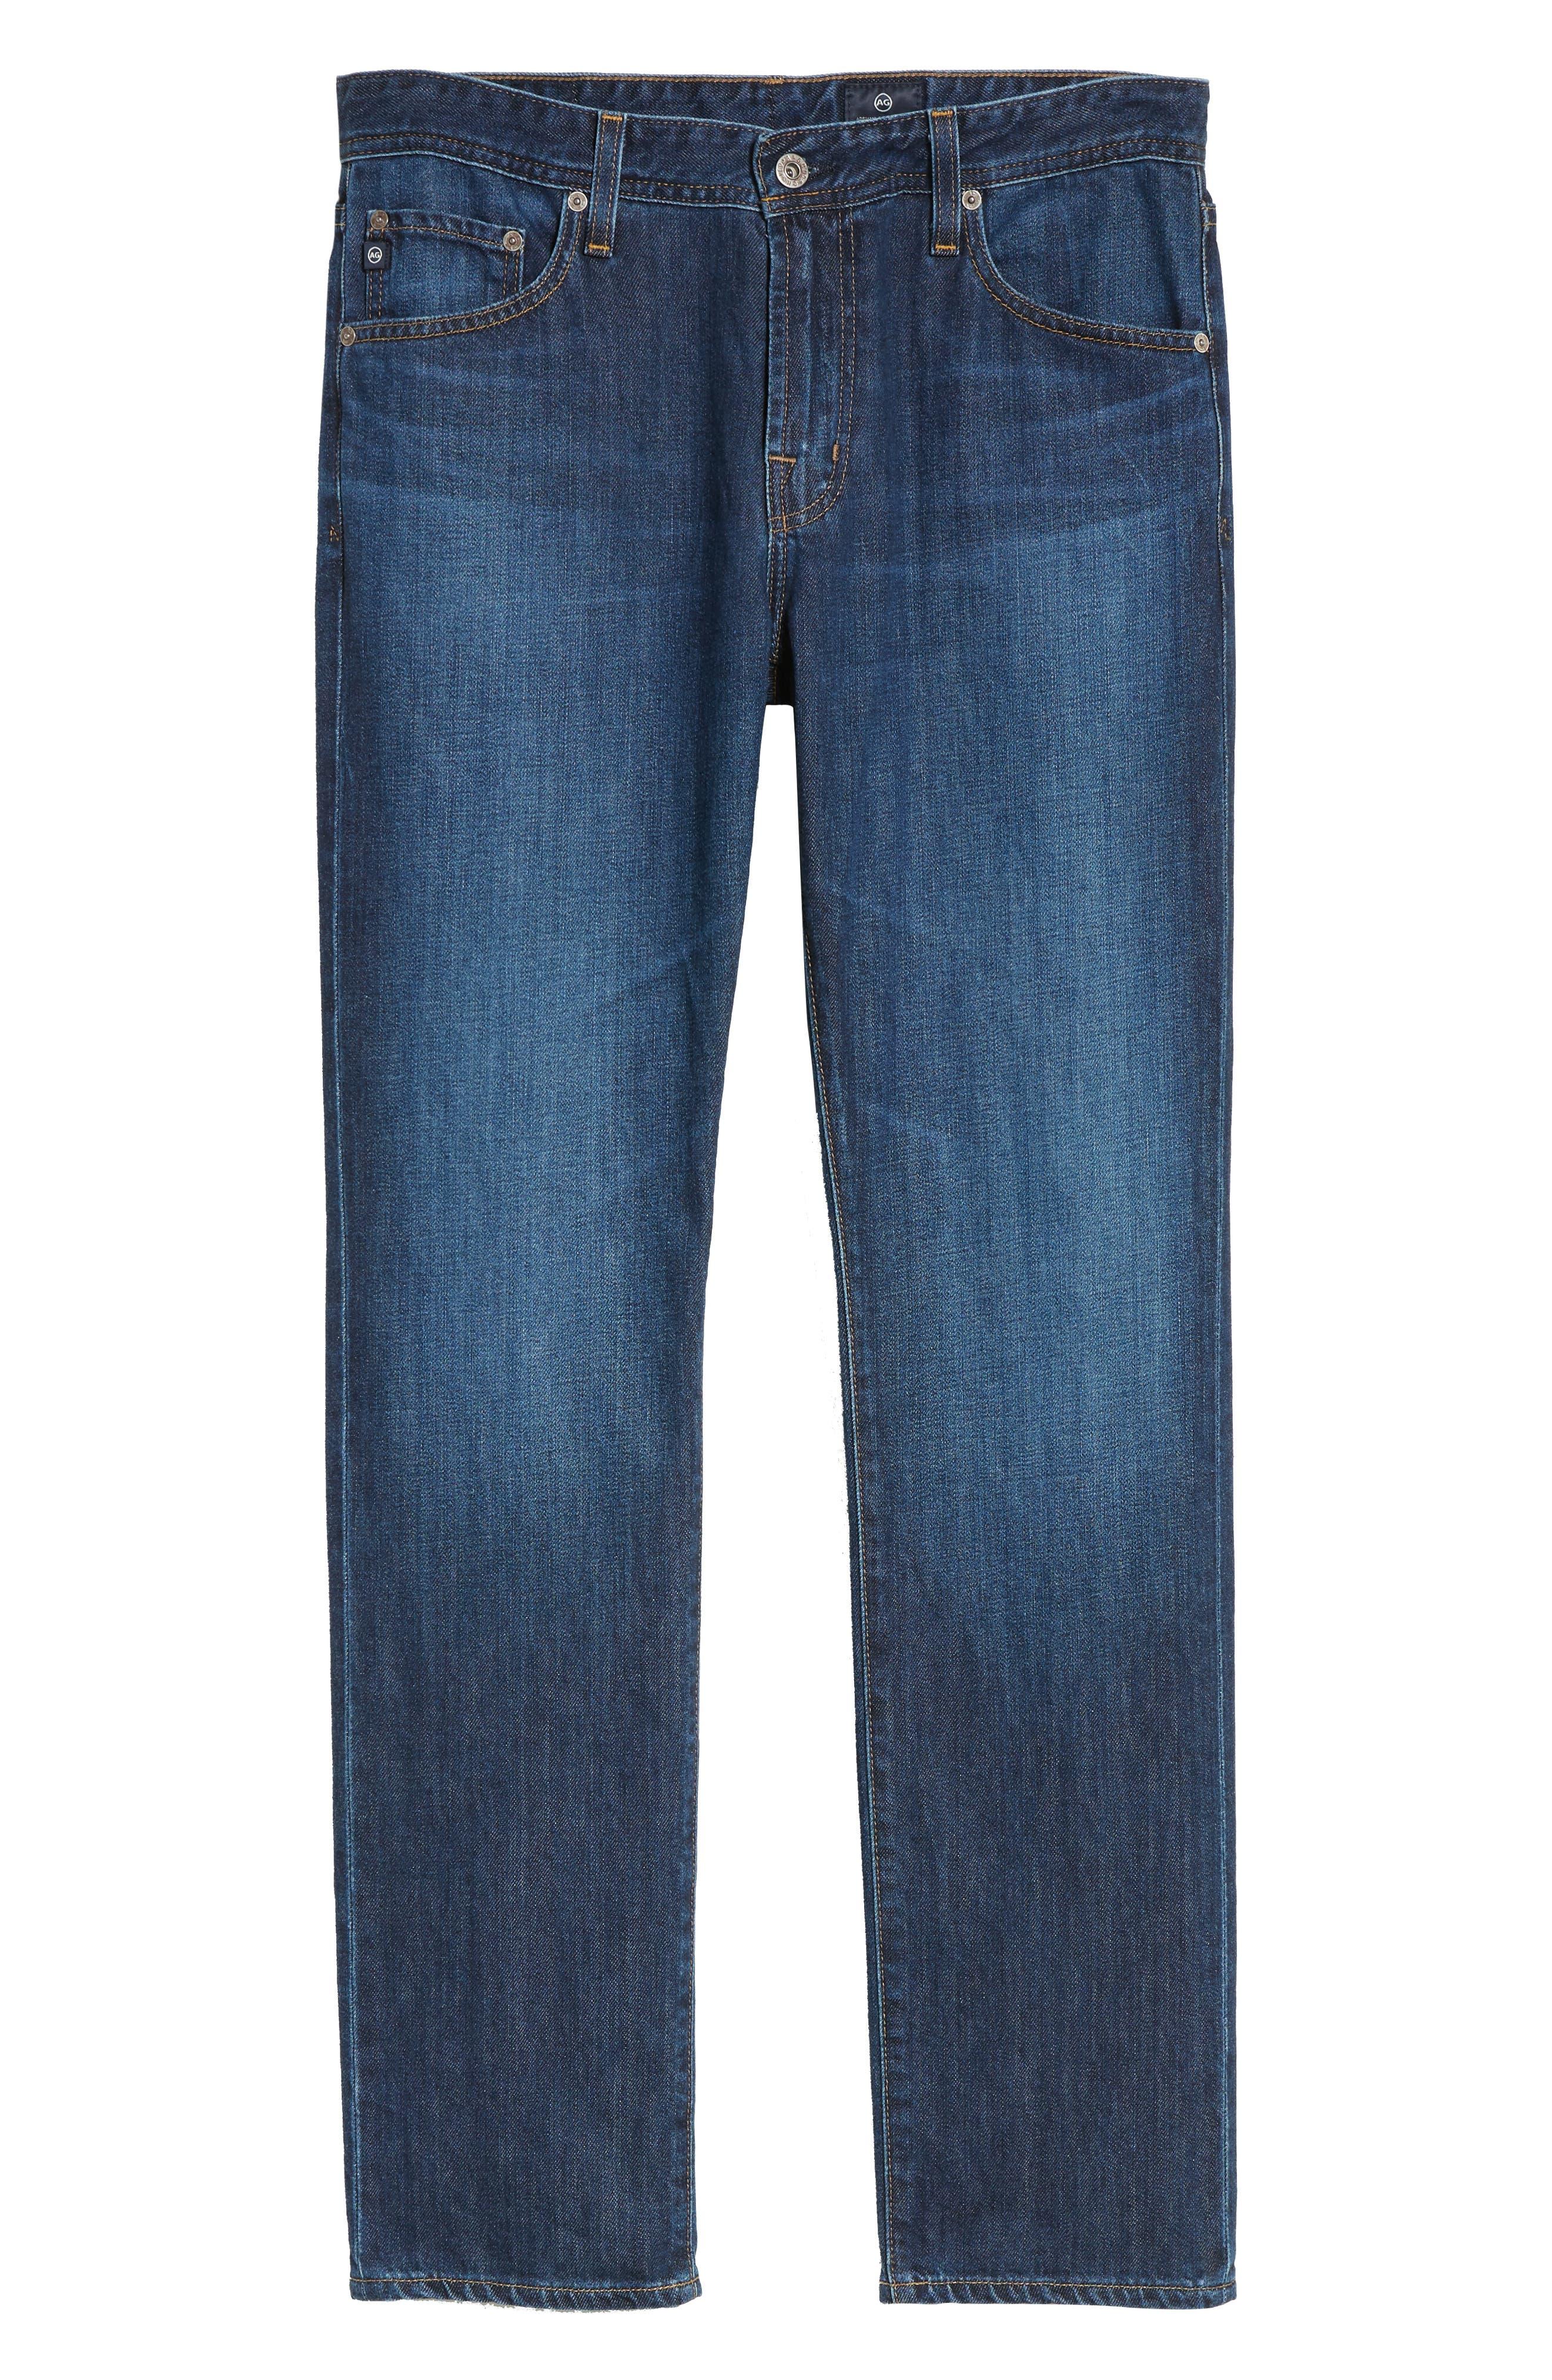 Graduate Slim Straight Leg Jeans,                             Alternate thumbnail 6, color,                             477